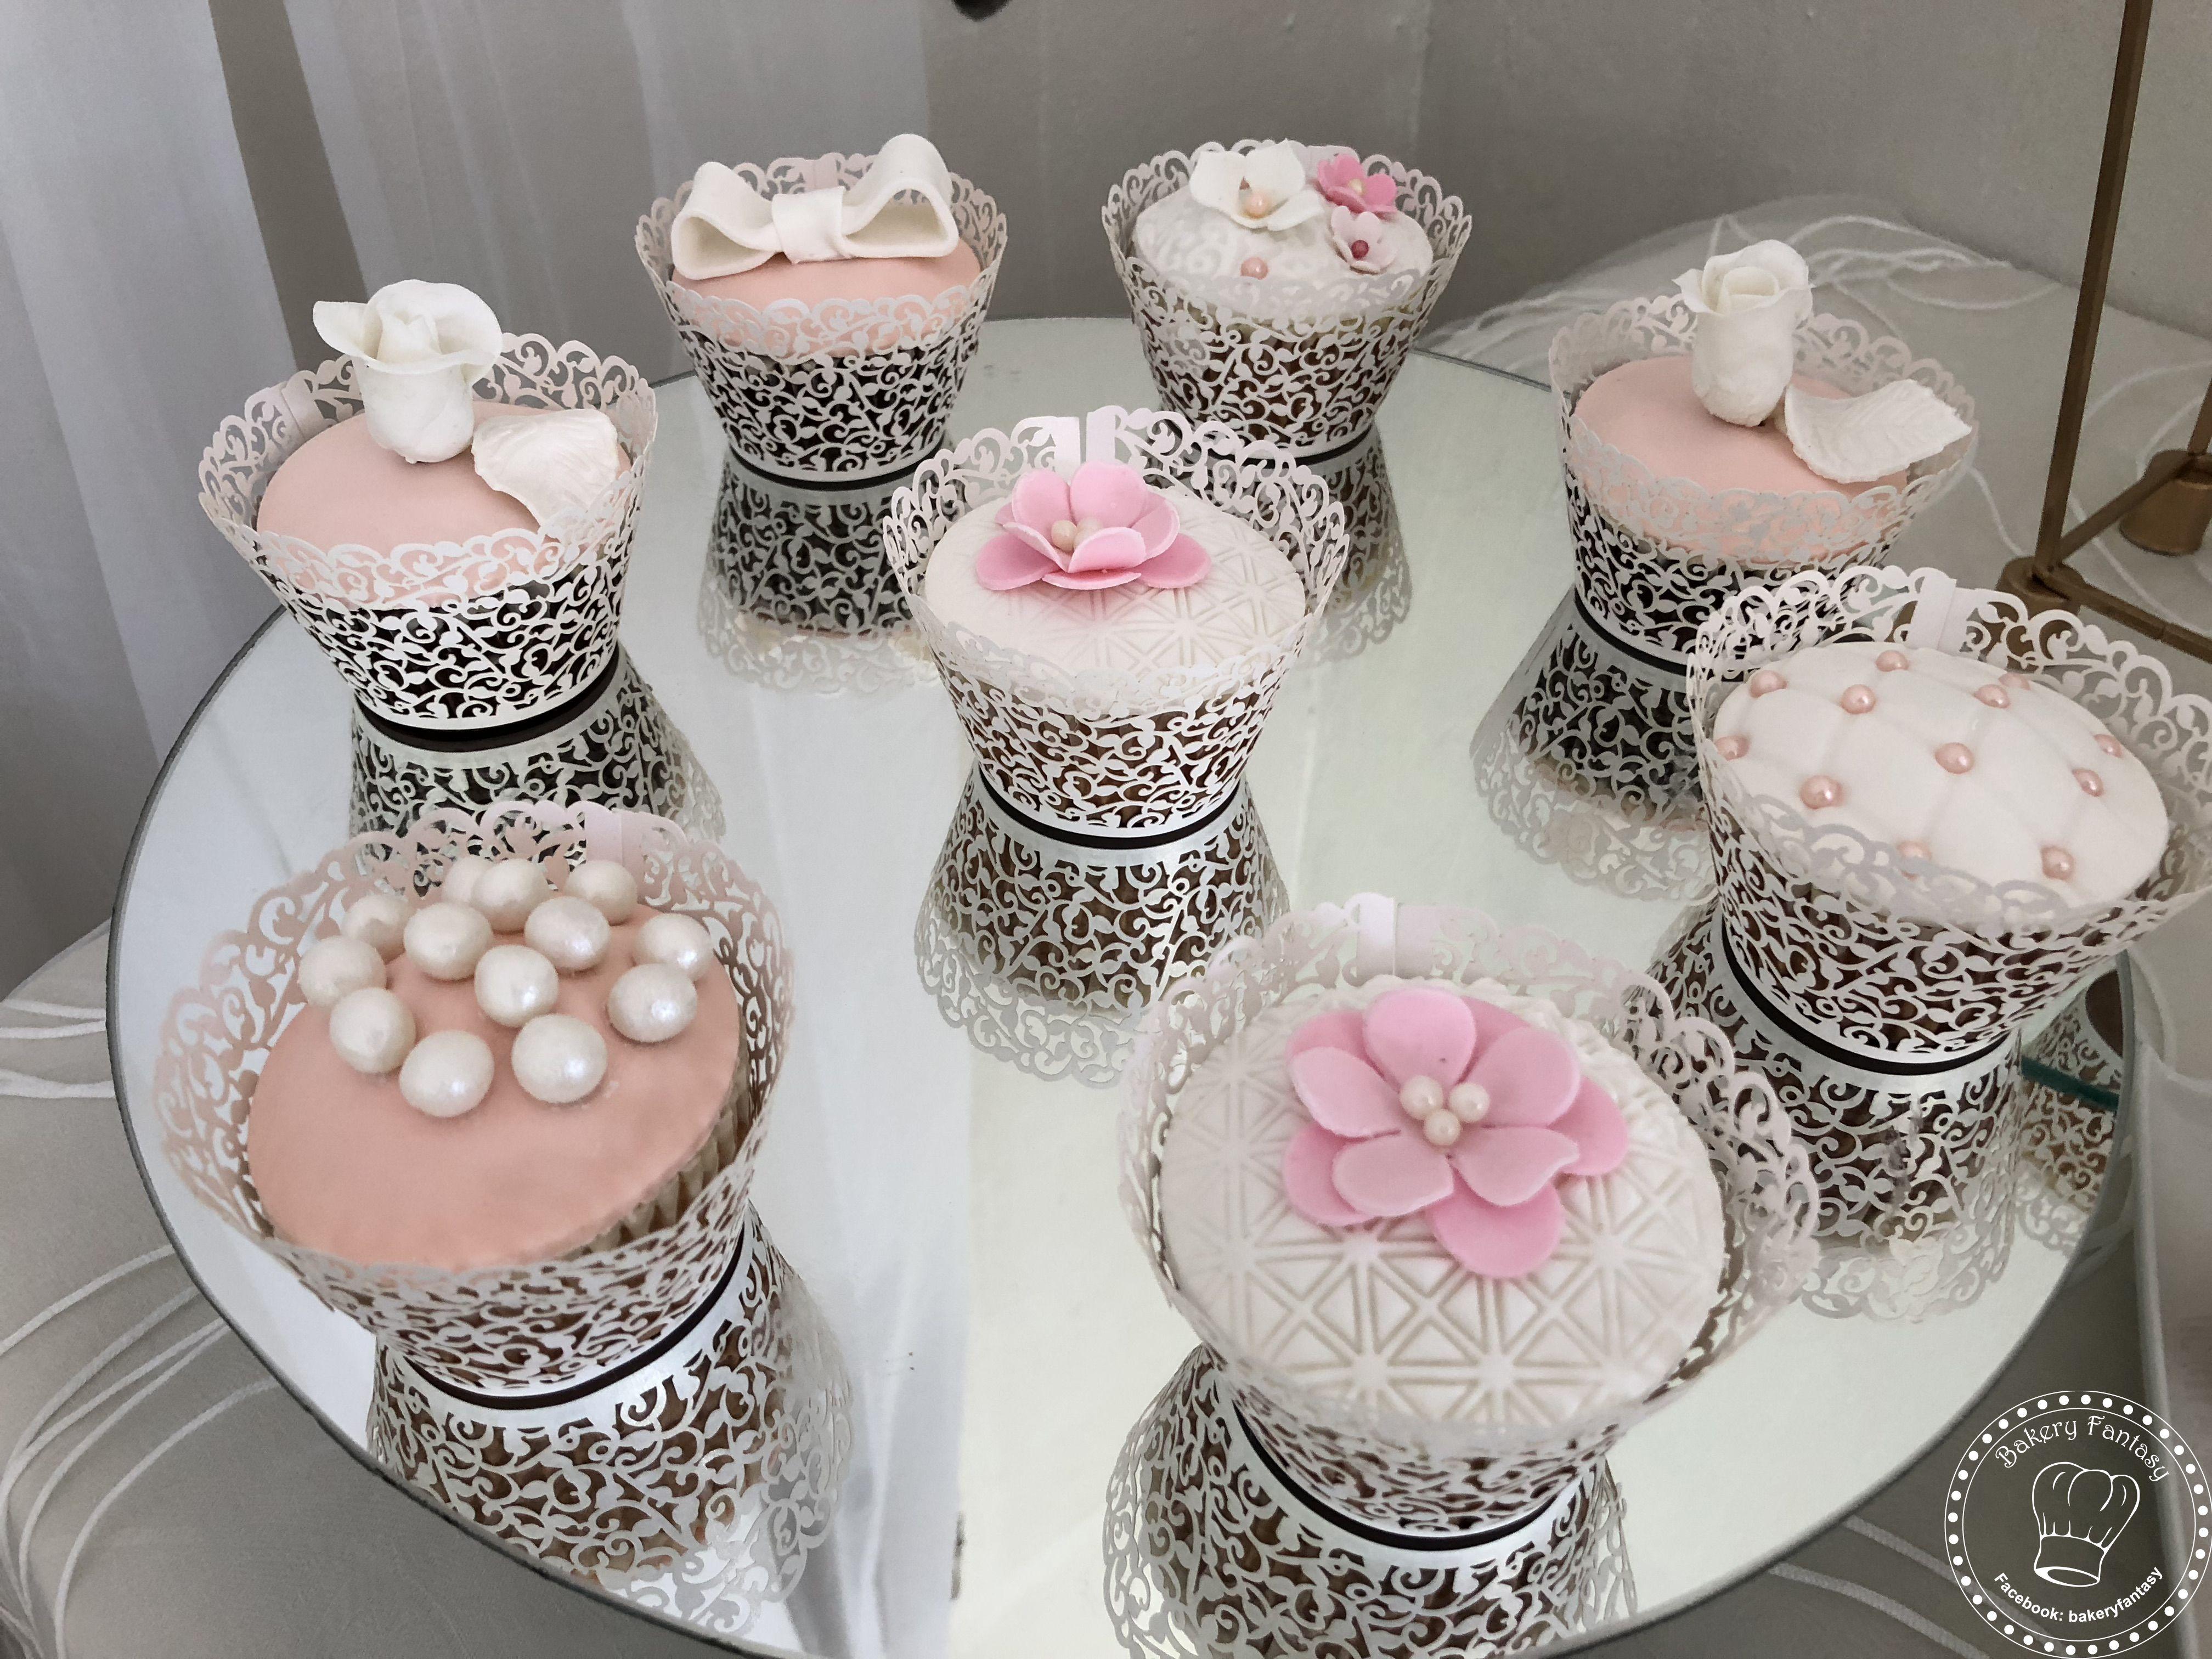 costaricawedding #bakeryfantasy #cupcakes #minicakes #weddingcake ...